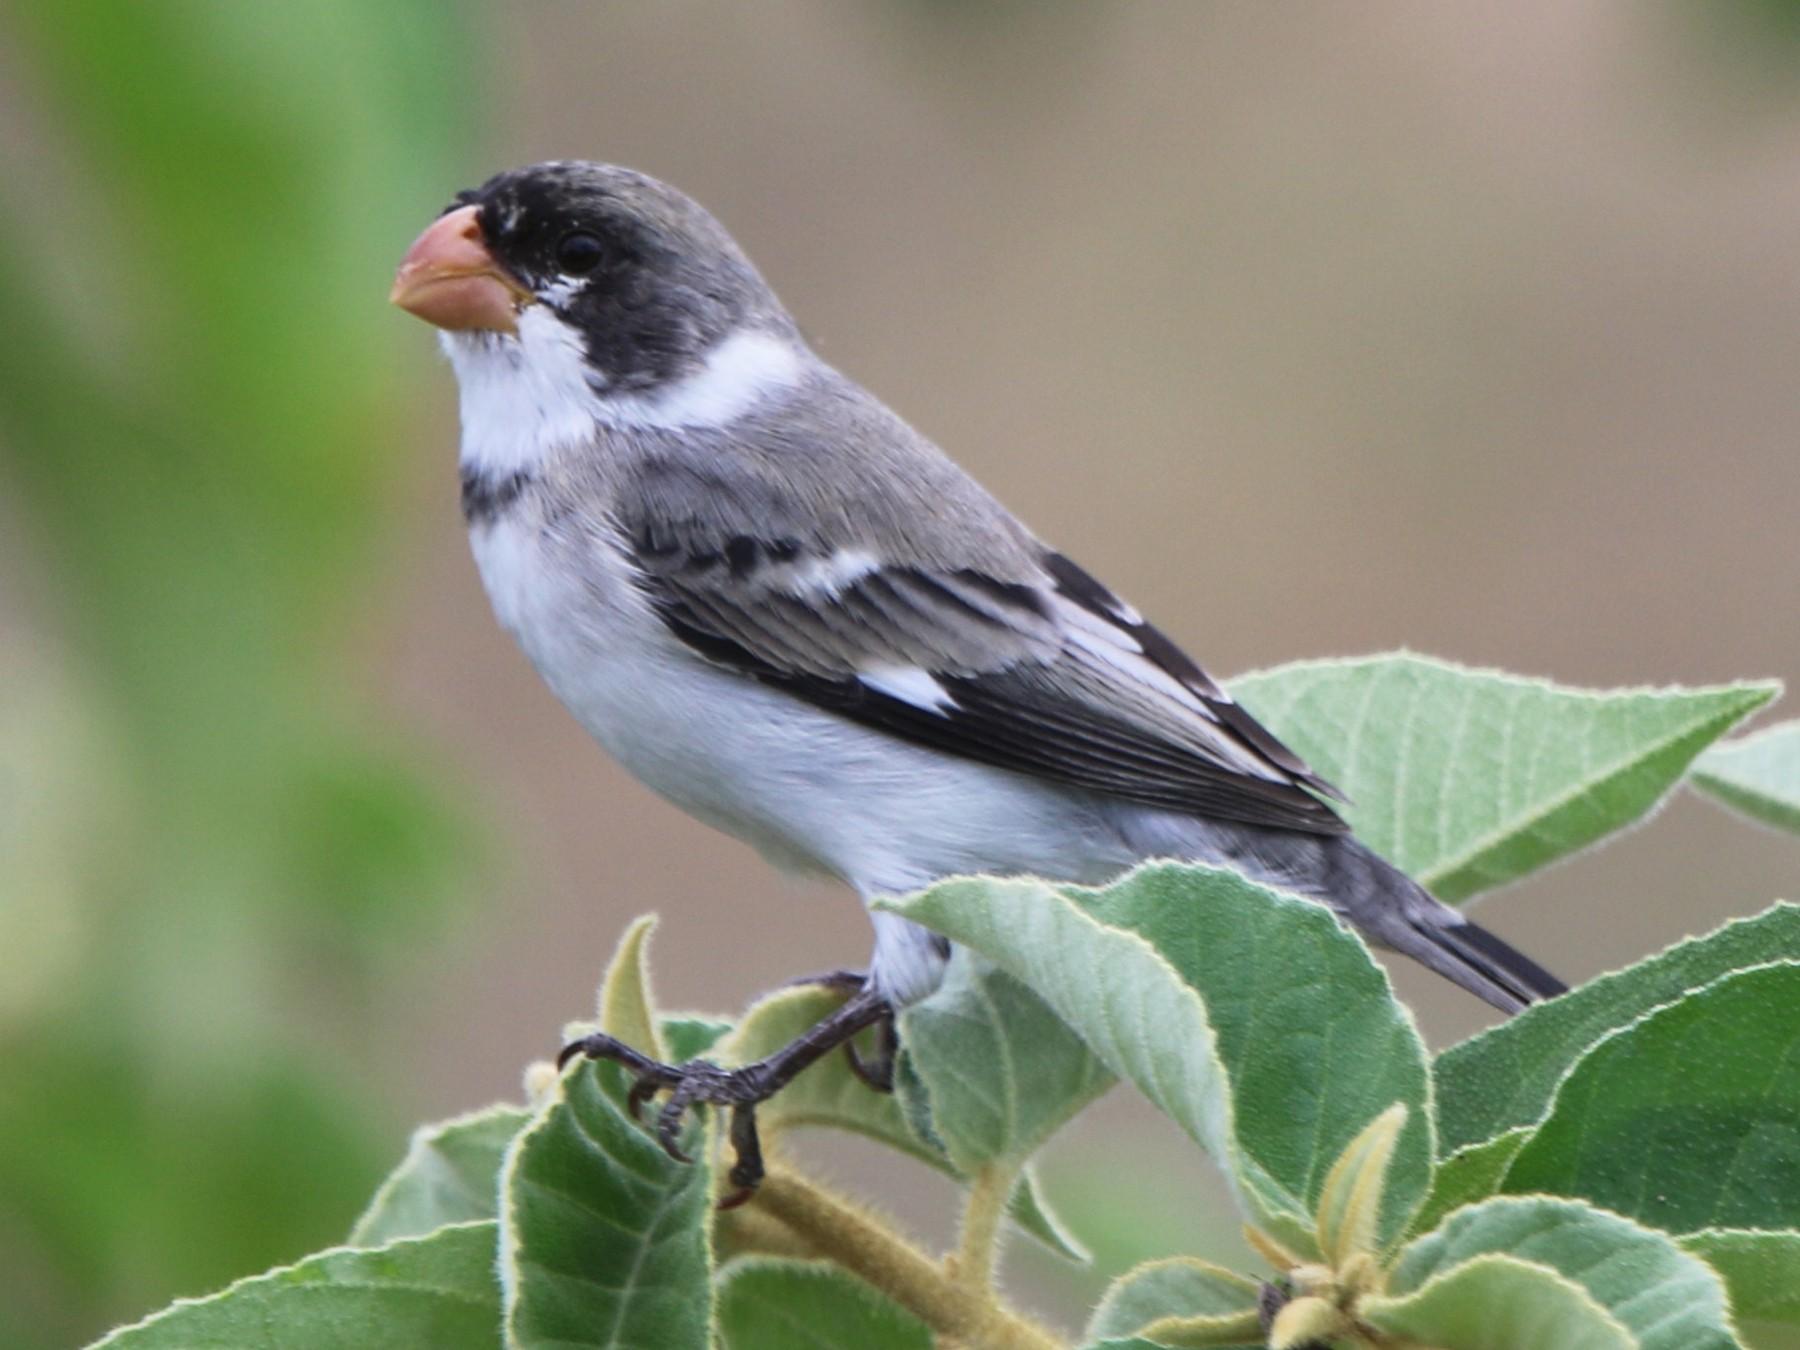 White-throated Seedeater - Thompson Ian